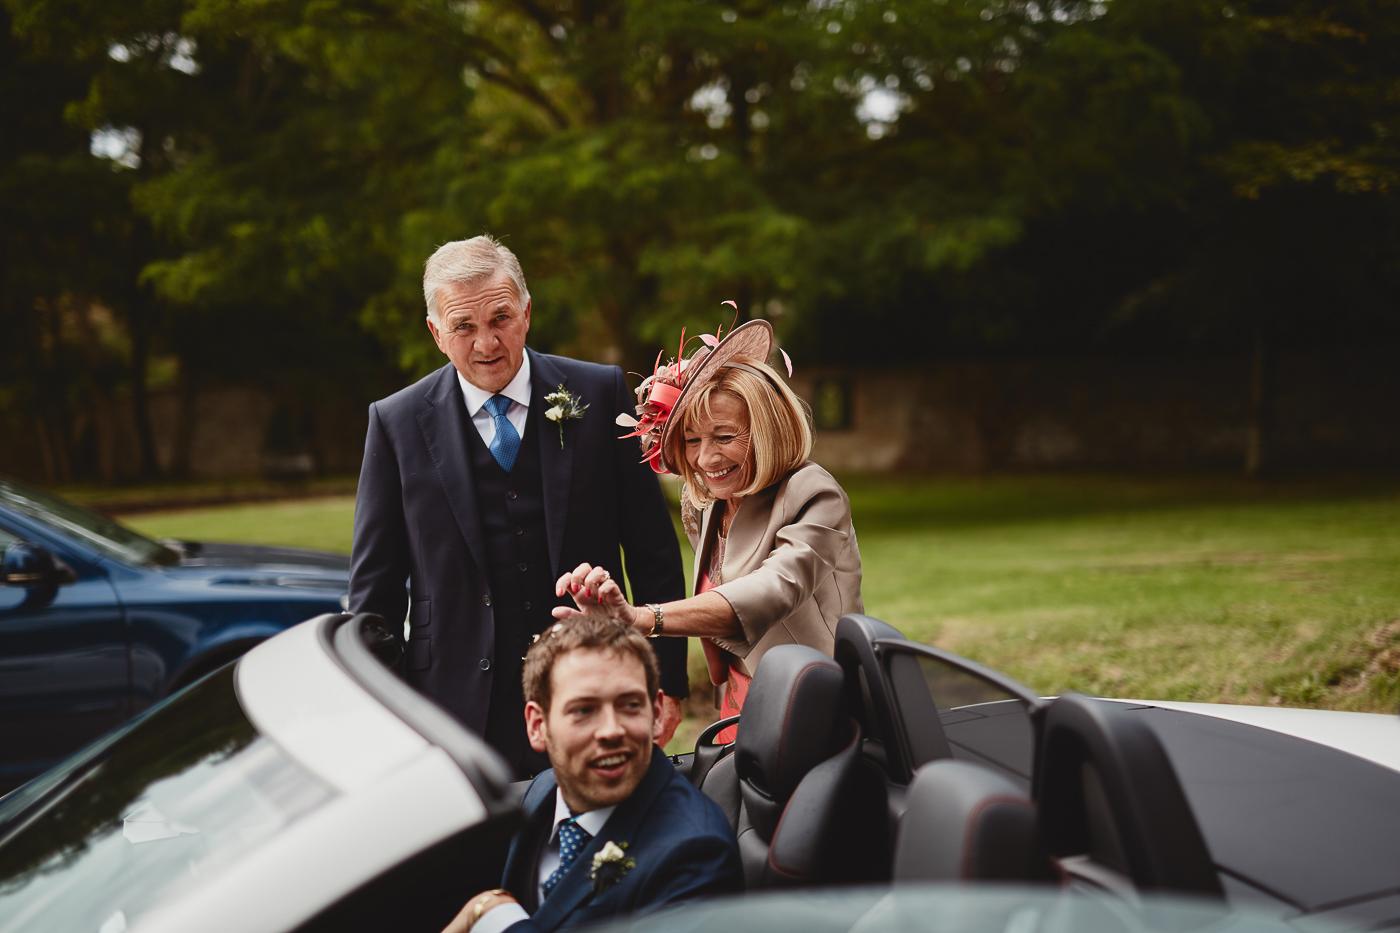 Danni_And_Jack_Gloucester_Wedding-81.jpg